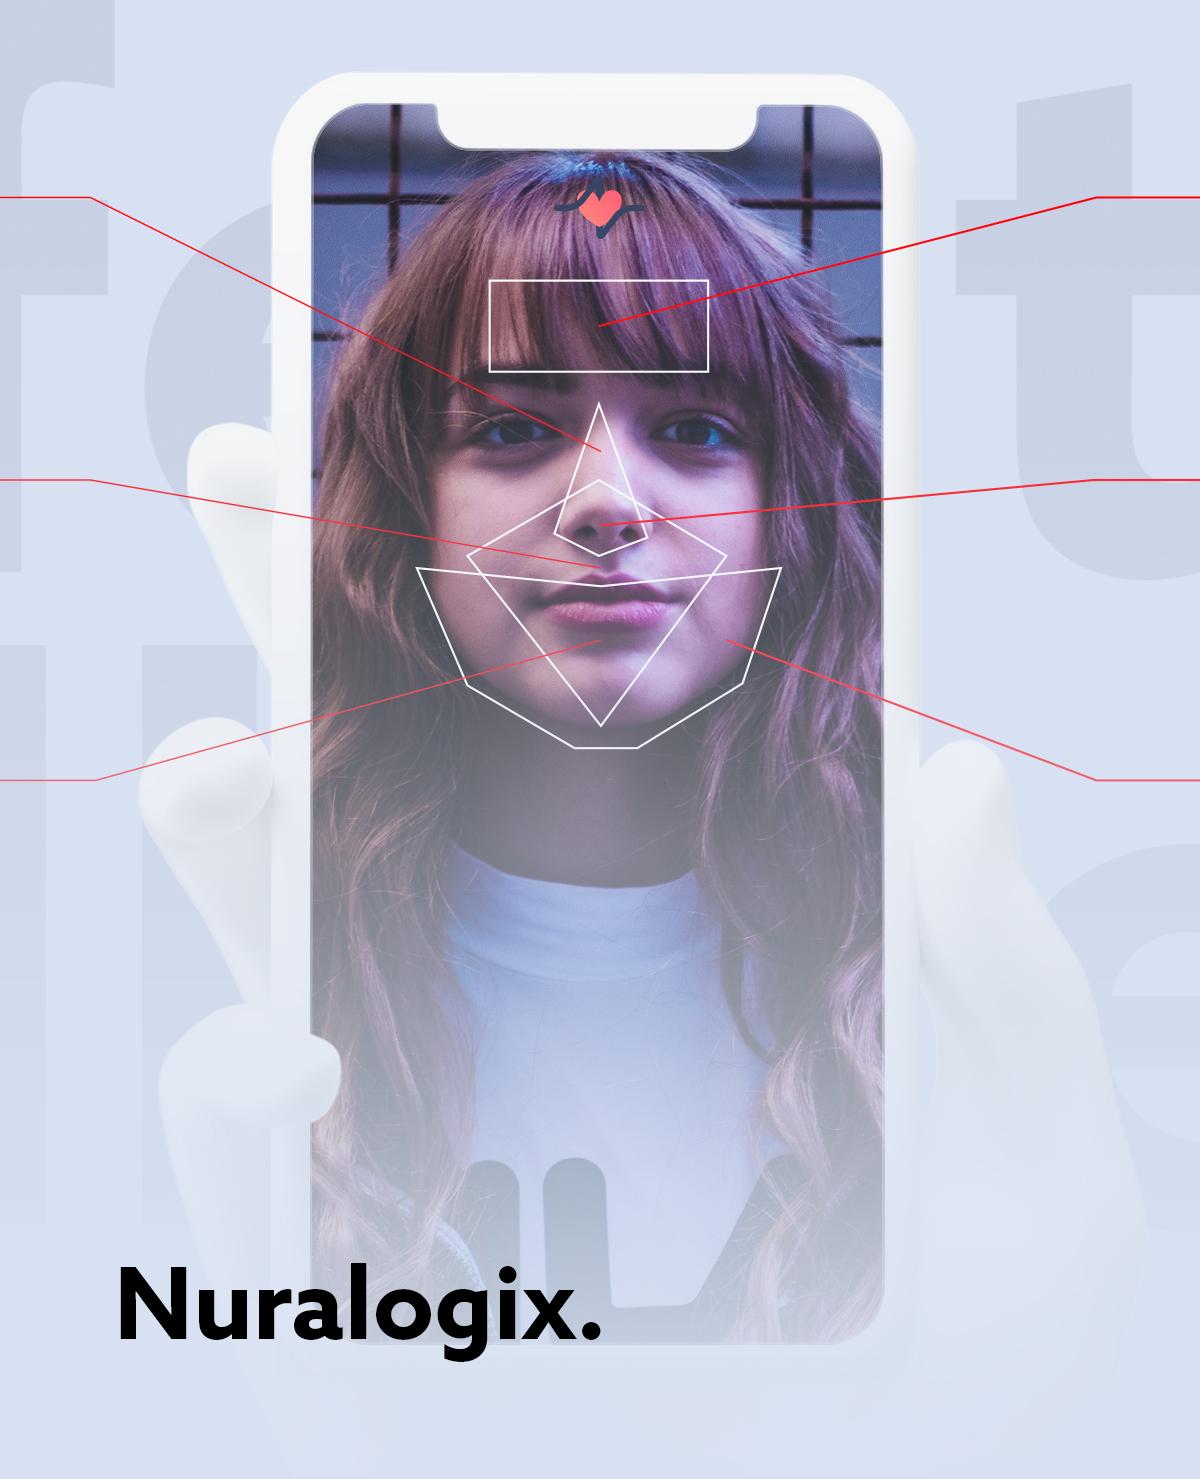 Nuralogix